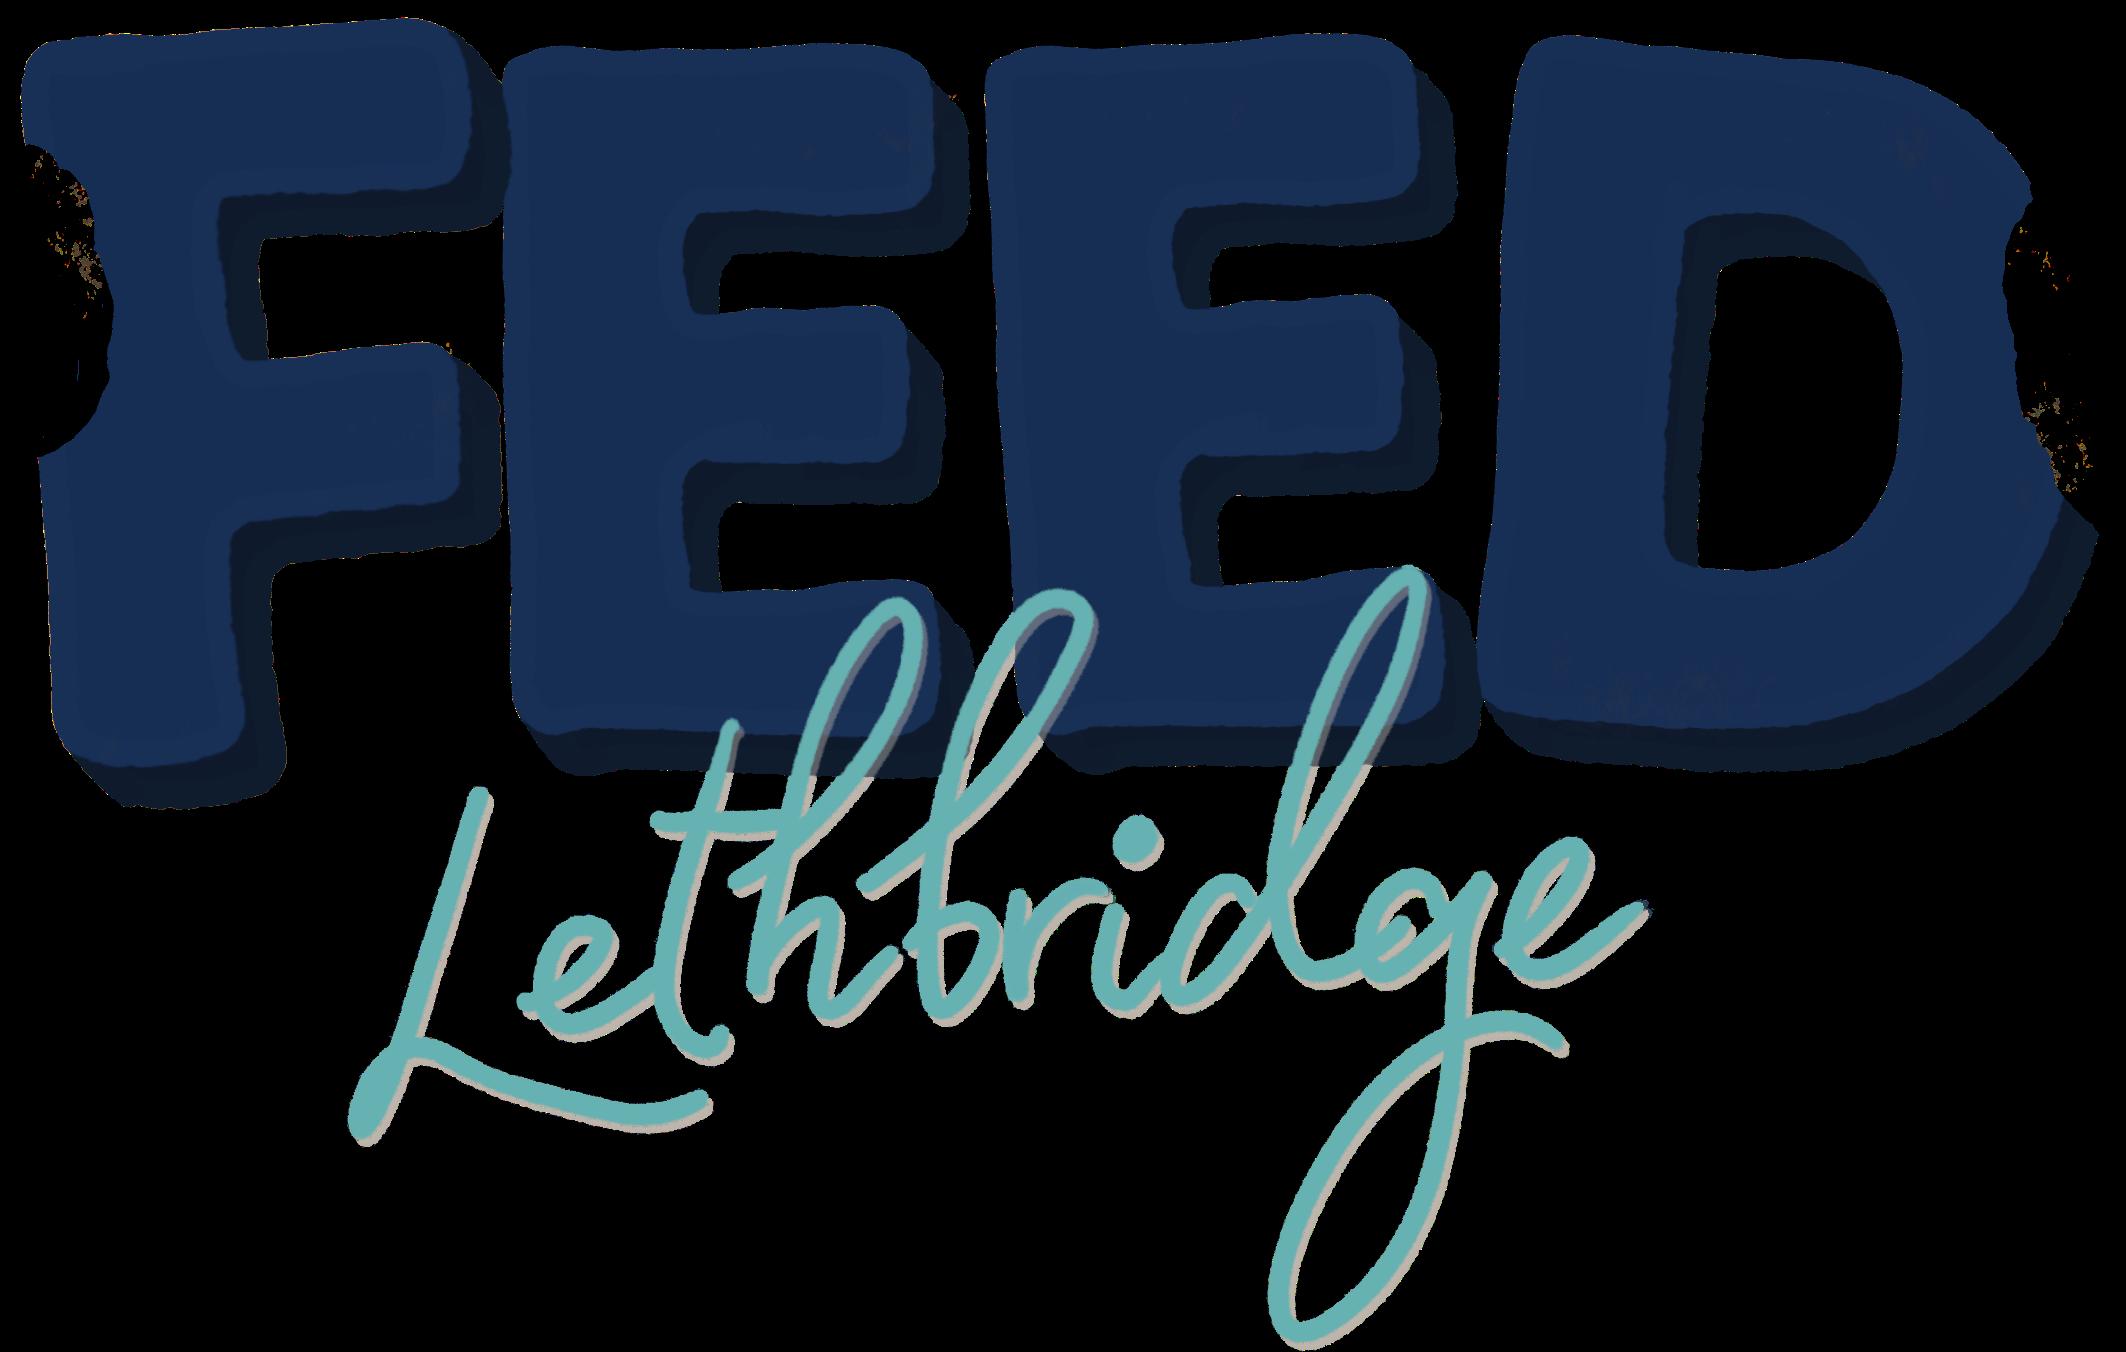 Feed Lethbridge